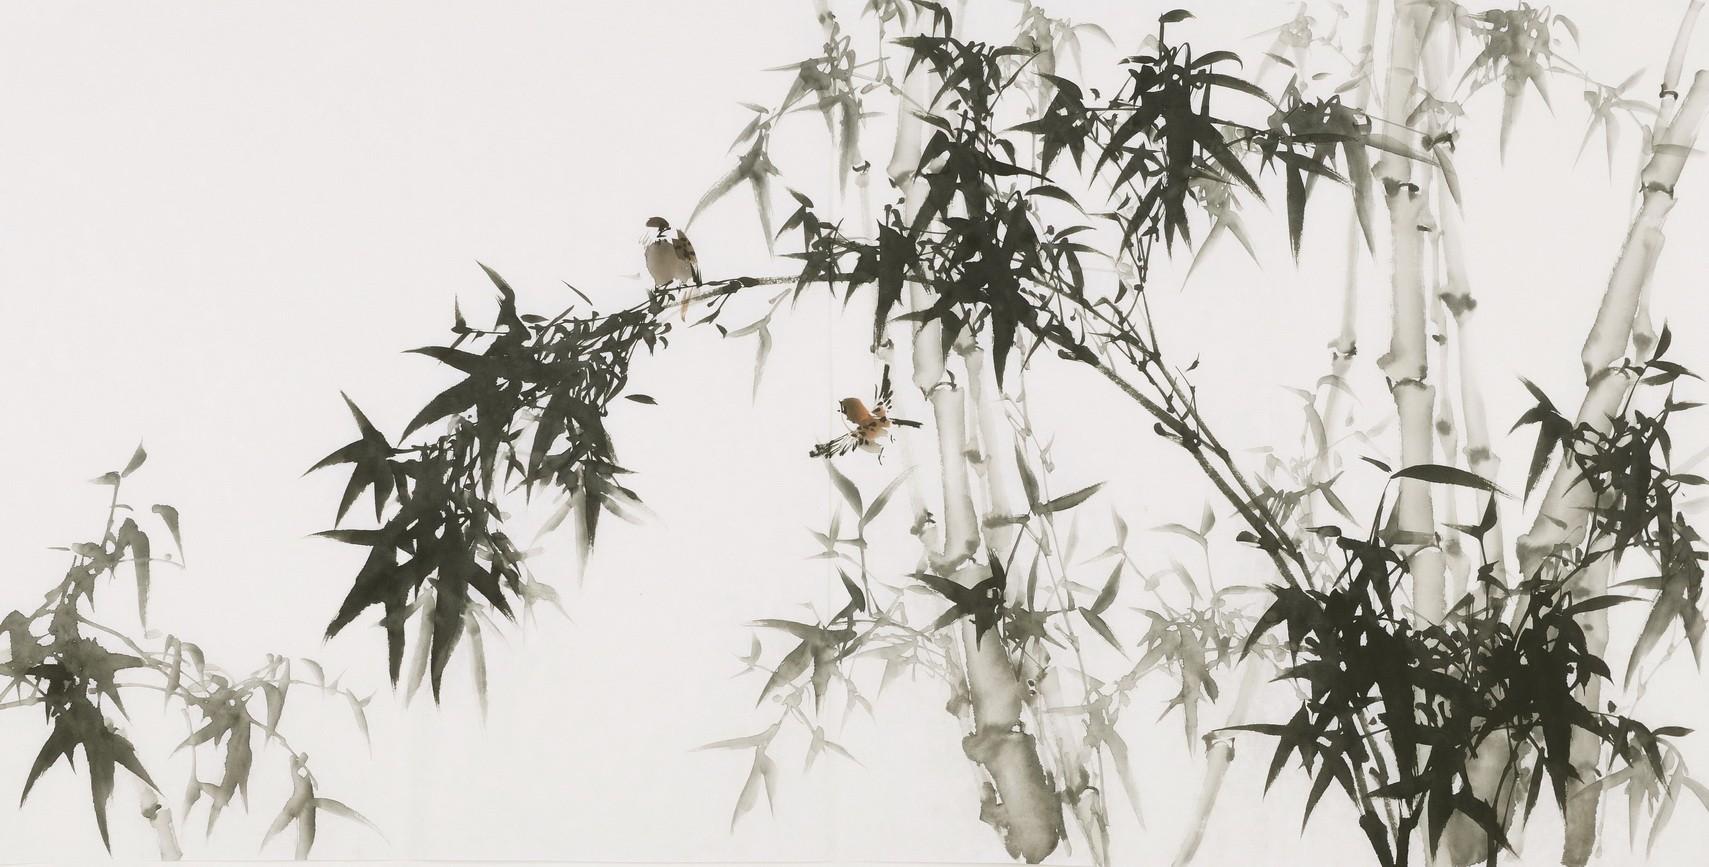 Ink Bamboo - CNAG003462